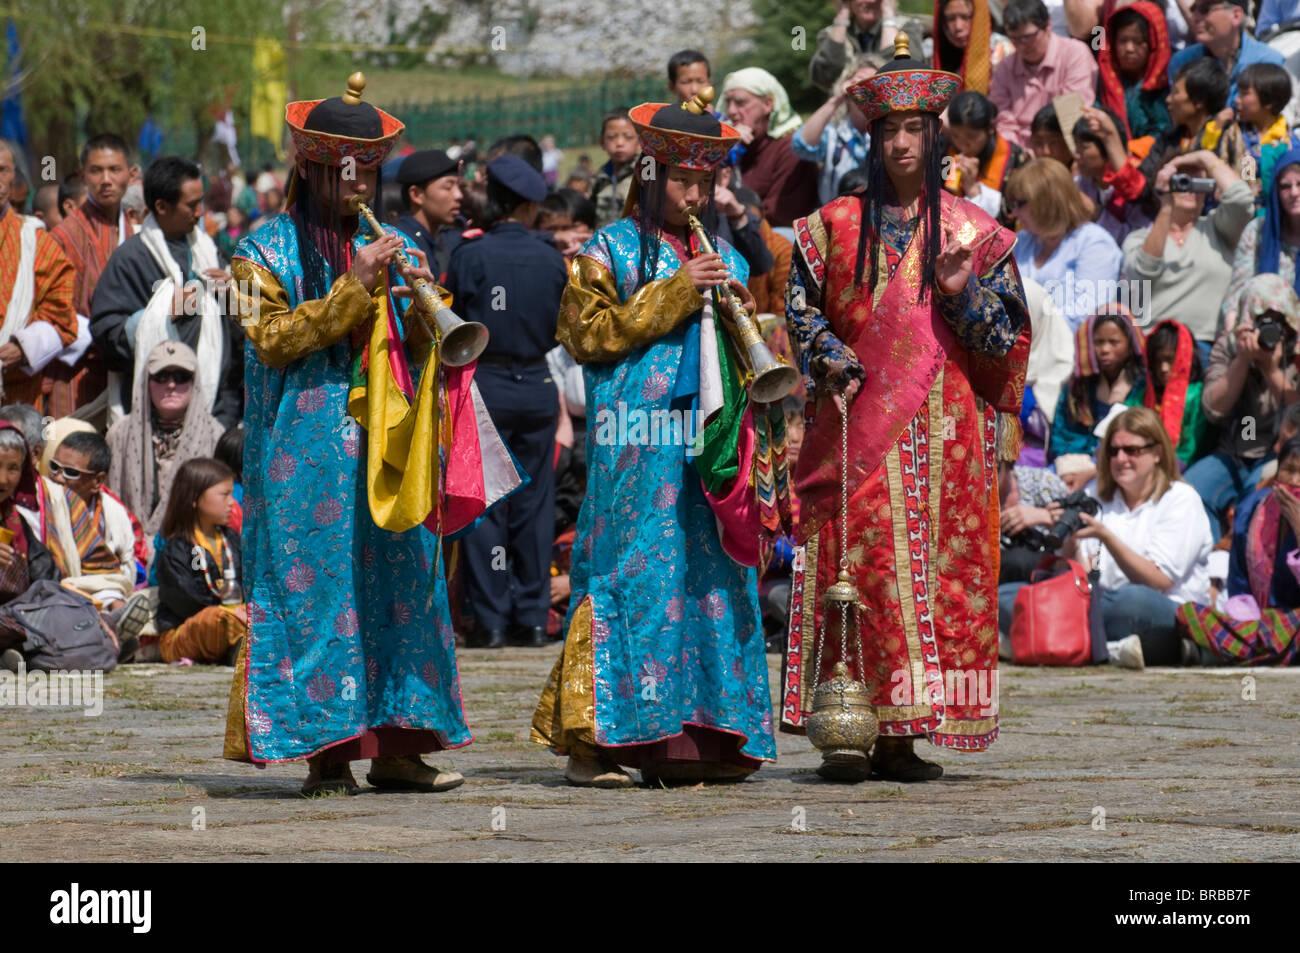 Buddhists playing the flute at religious festivity, Paro Tsechu, Paro, Bhutan - Stock Image